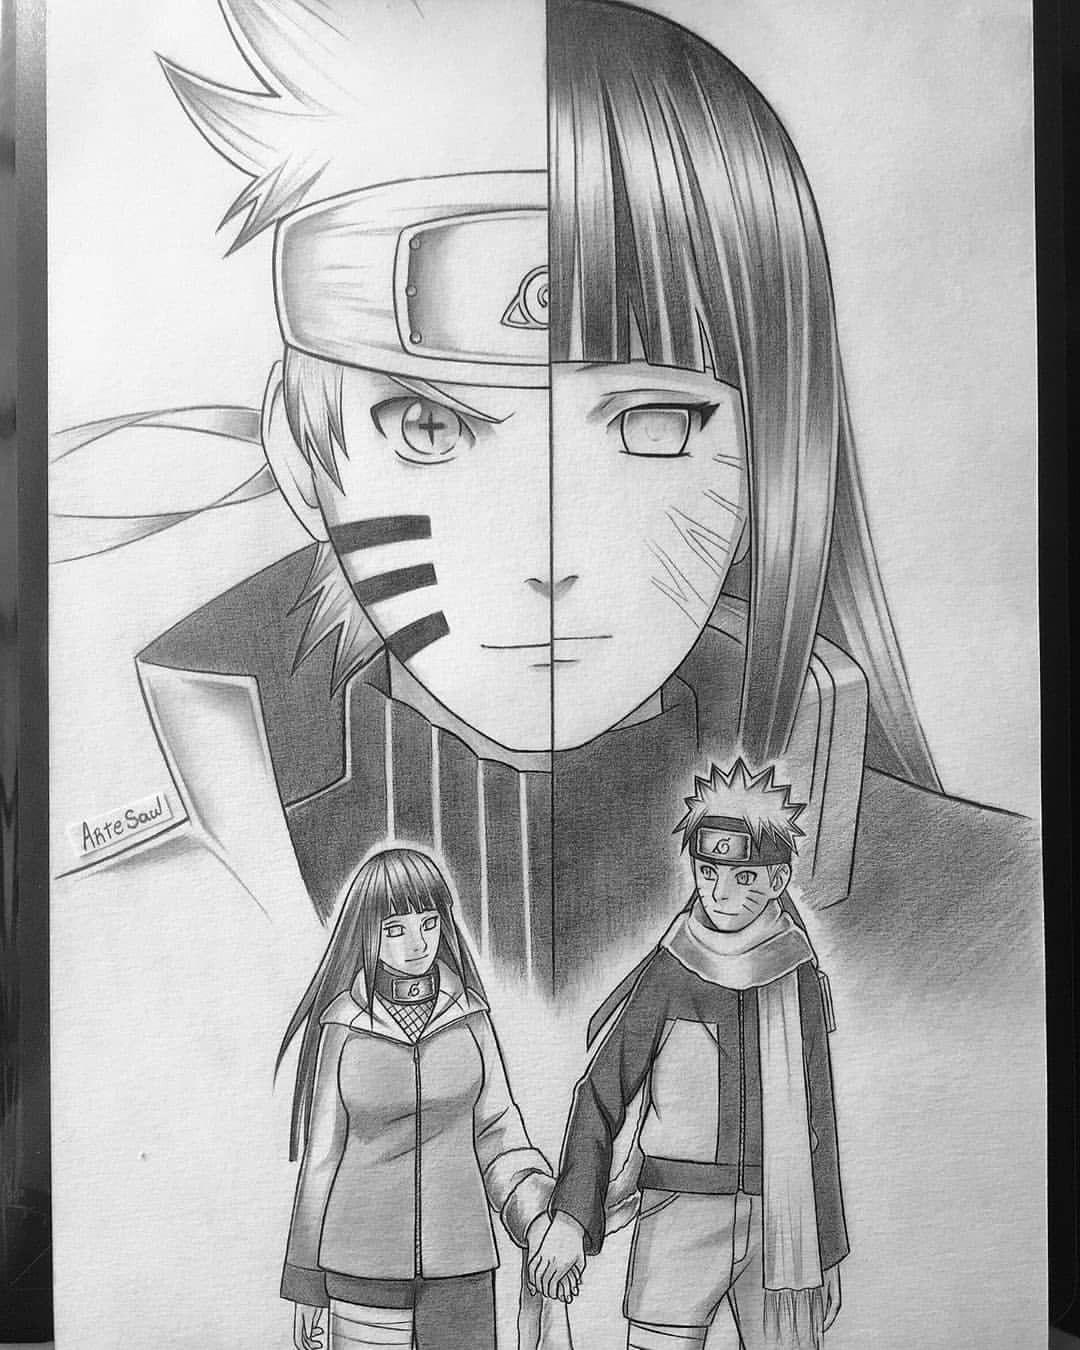 Como Desenhar Animes Em 2020 Naruto E Sasuke Desenho Arte Naruto Naruto Desenho